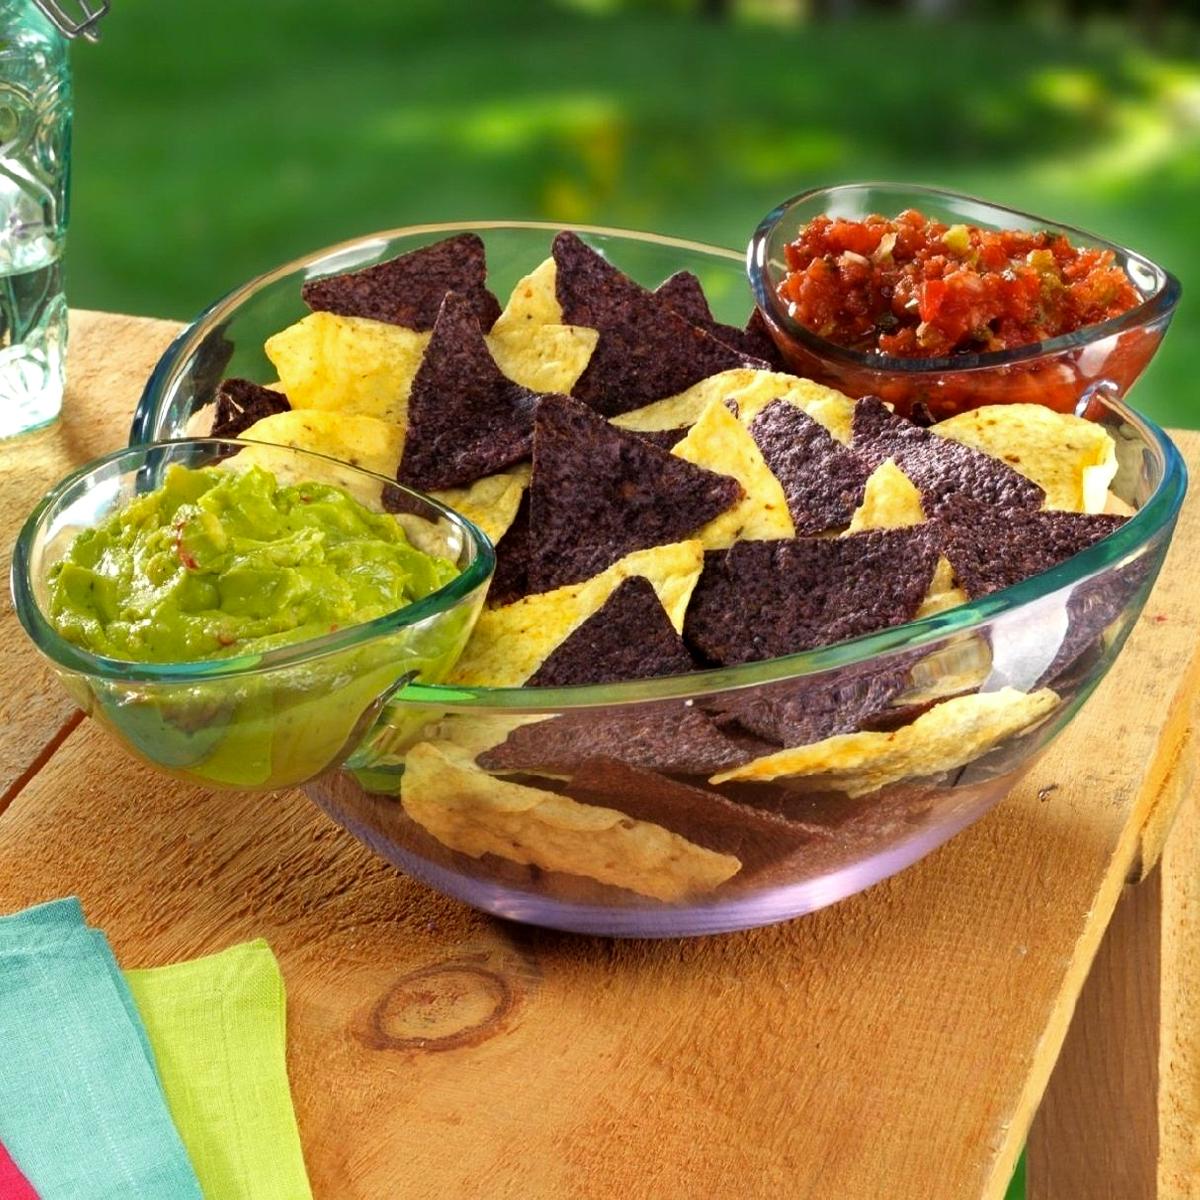 3pc Plastic Chip N' Dip Serving Bowls Set Snack Dishes Appetizers Sauces Parties